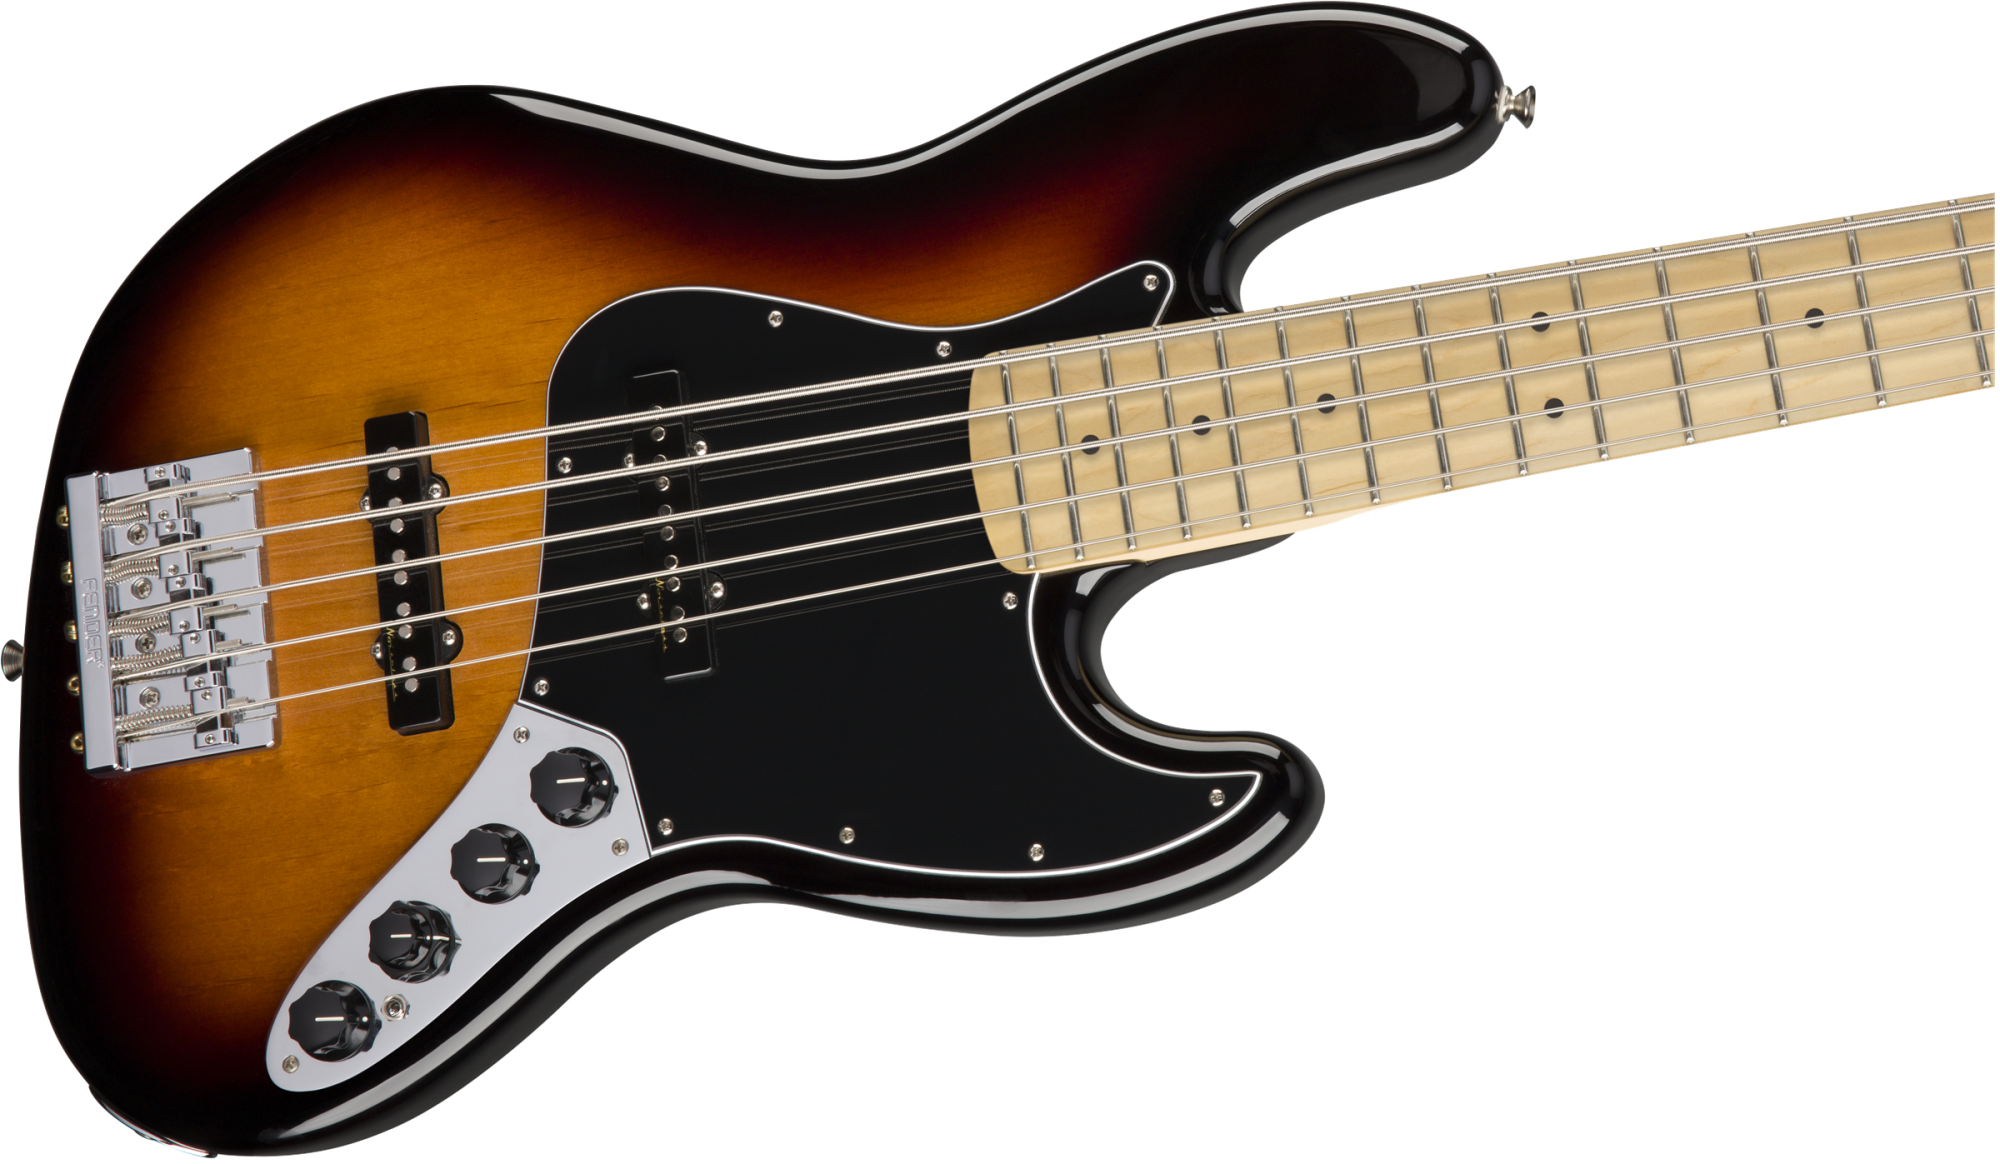 Fender Deluxe Active Jazz Bass V Maple Fingerboard - 3-Color Sunburst